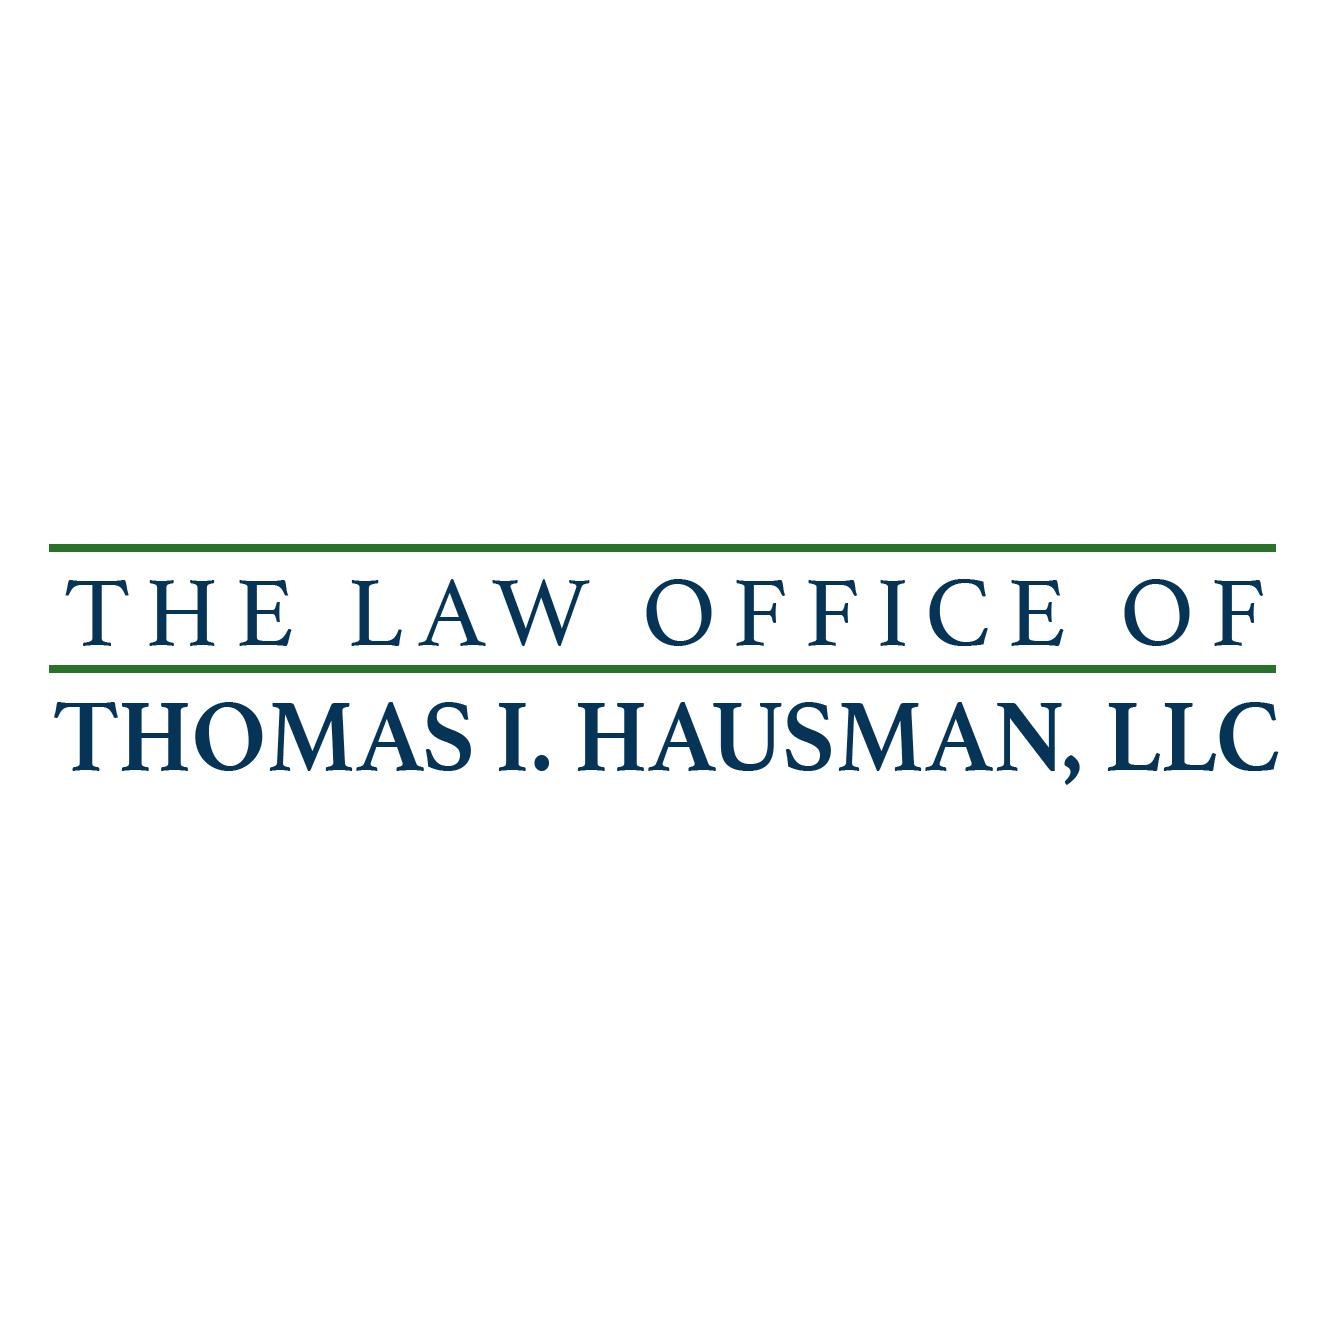 The Law Office of Thomas I. Hausman, LLC